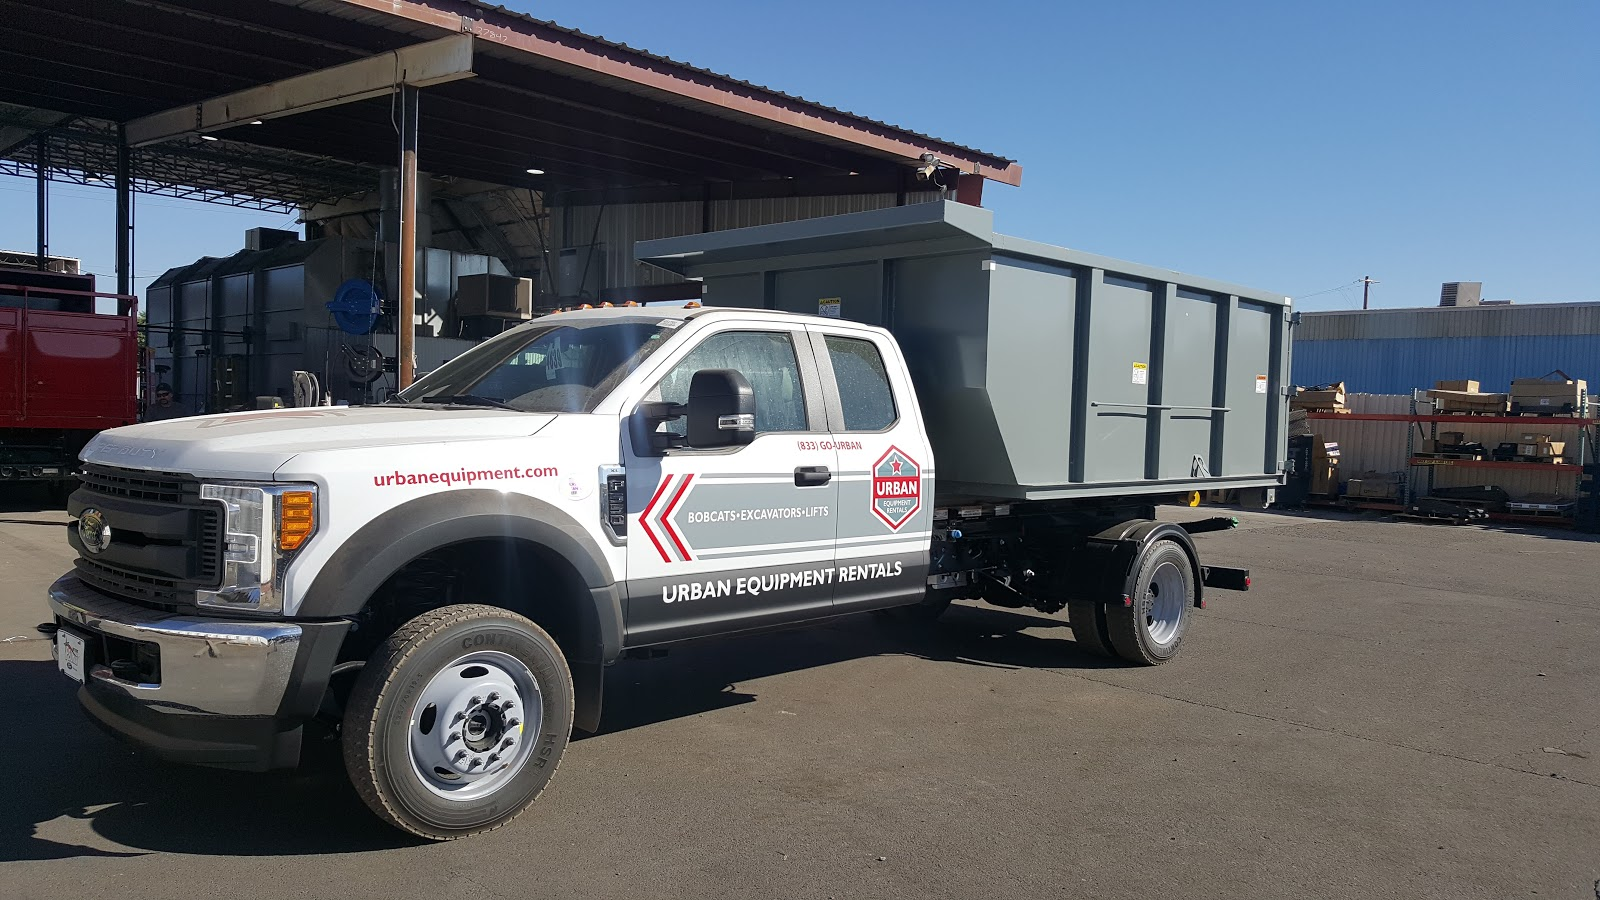 Urban Equipment Rentals F550 Landscape Truck